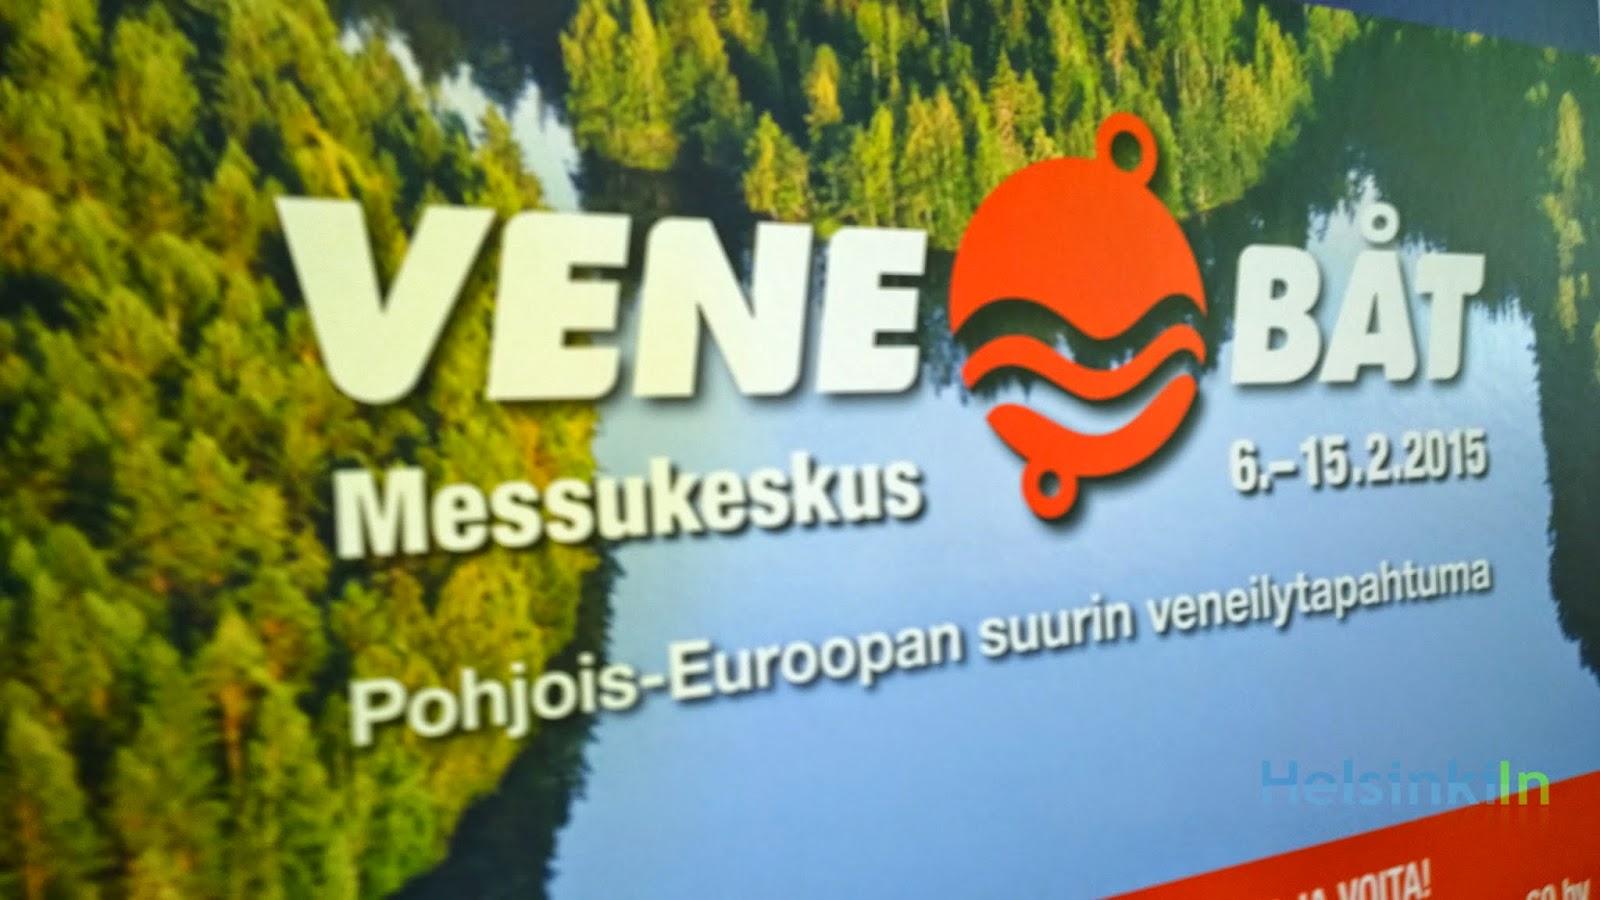 Helsinki International Boat Show Vene/Båt.